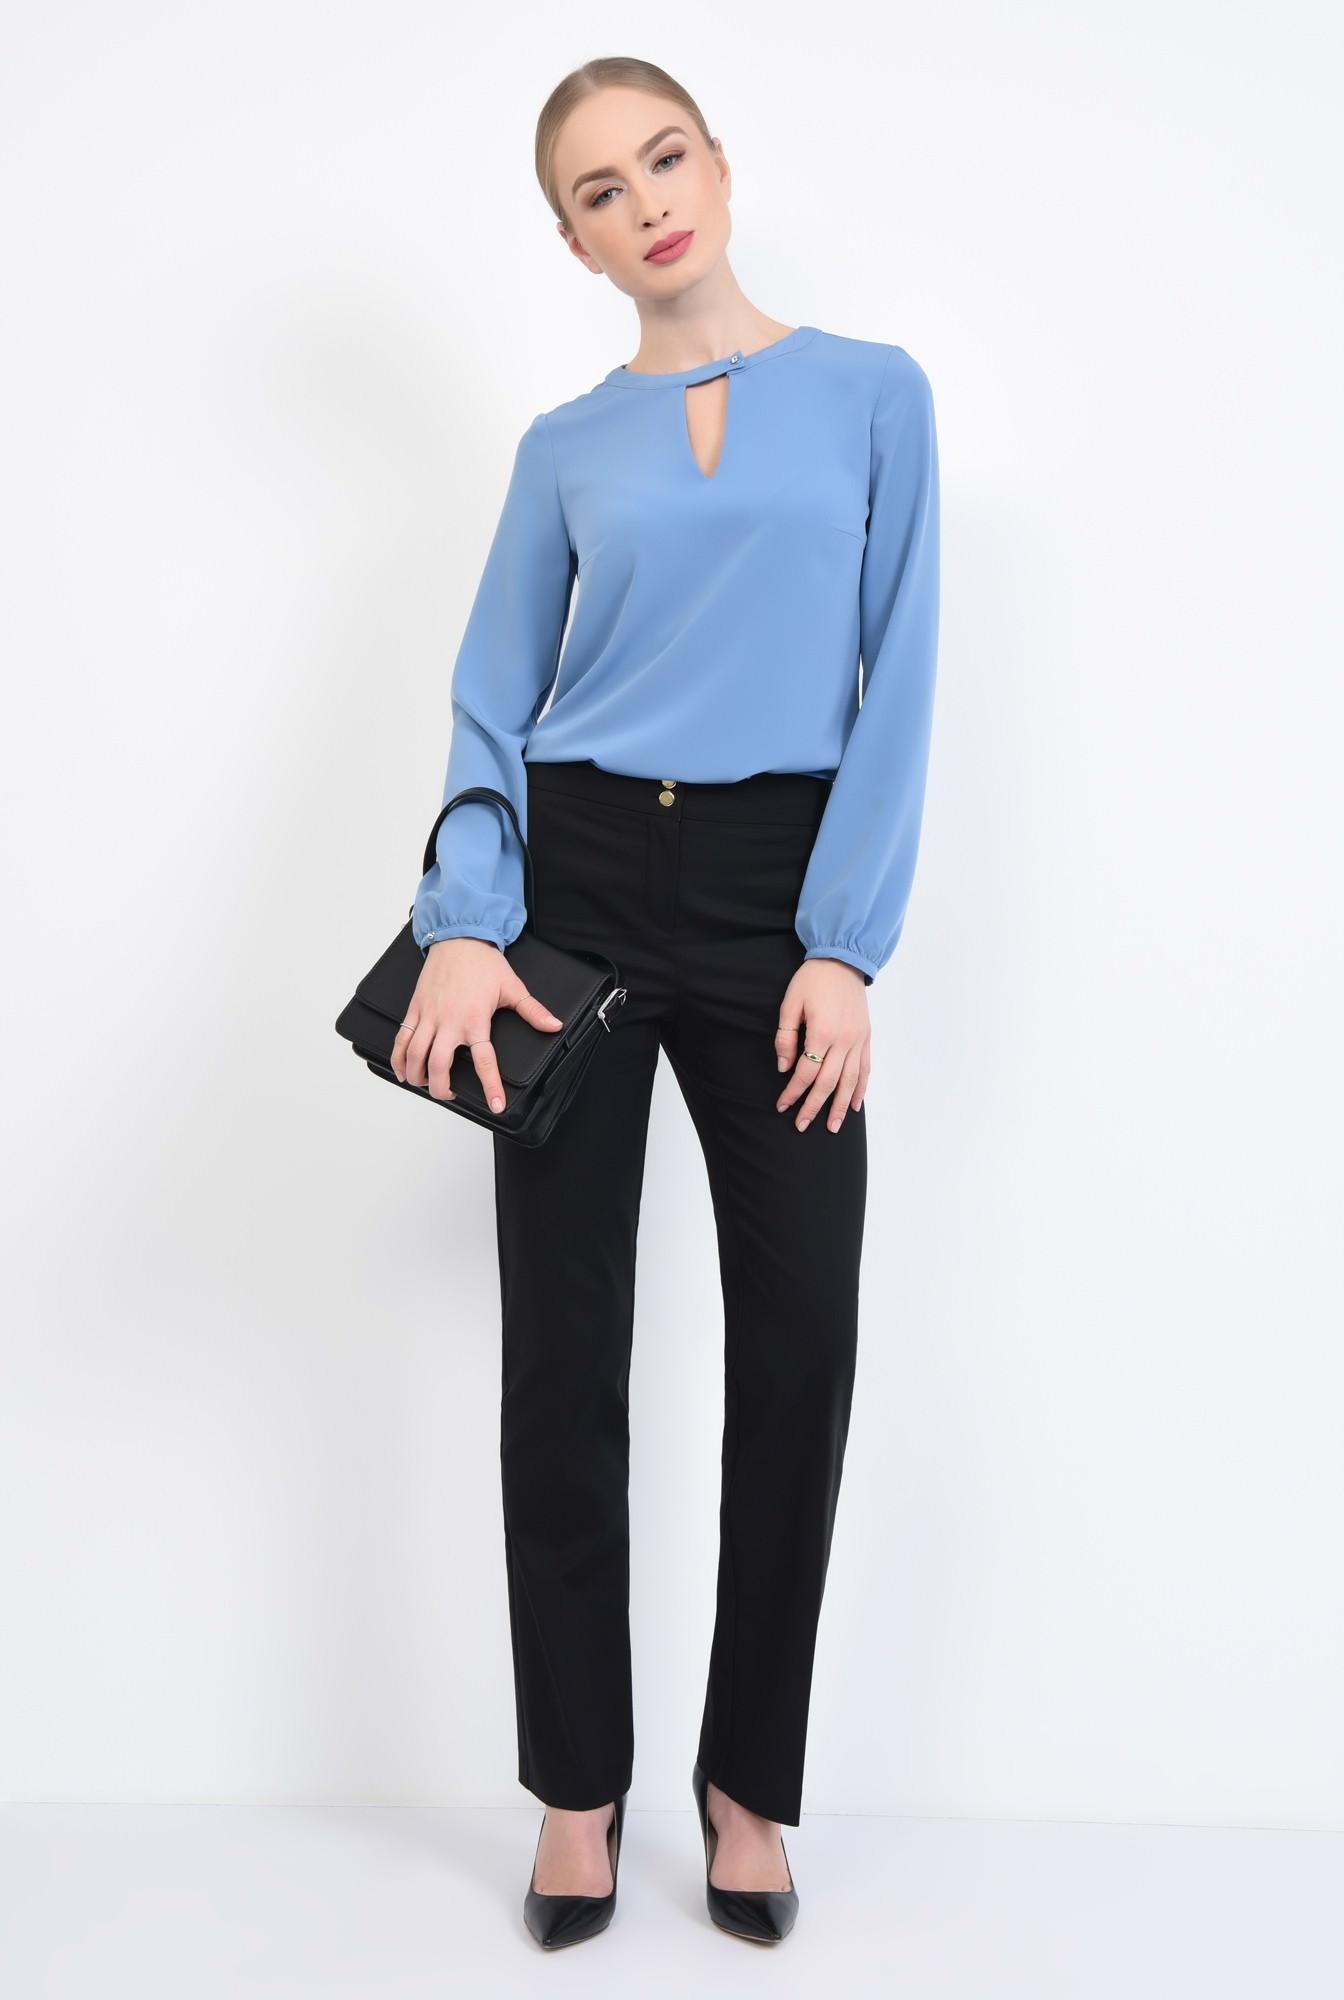 3 - 360 - Bluza casual, bleu, maneci lungi